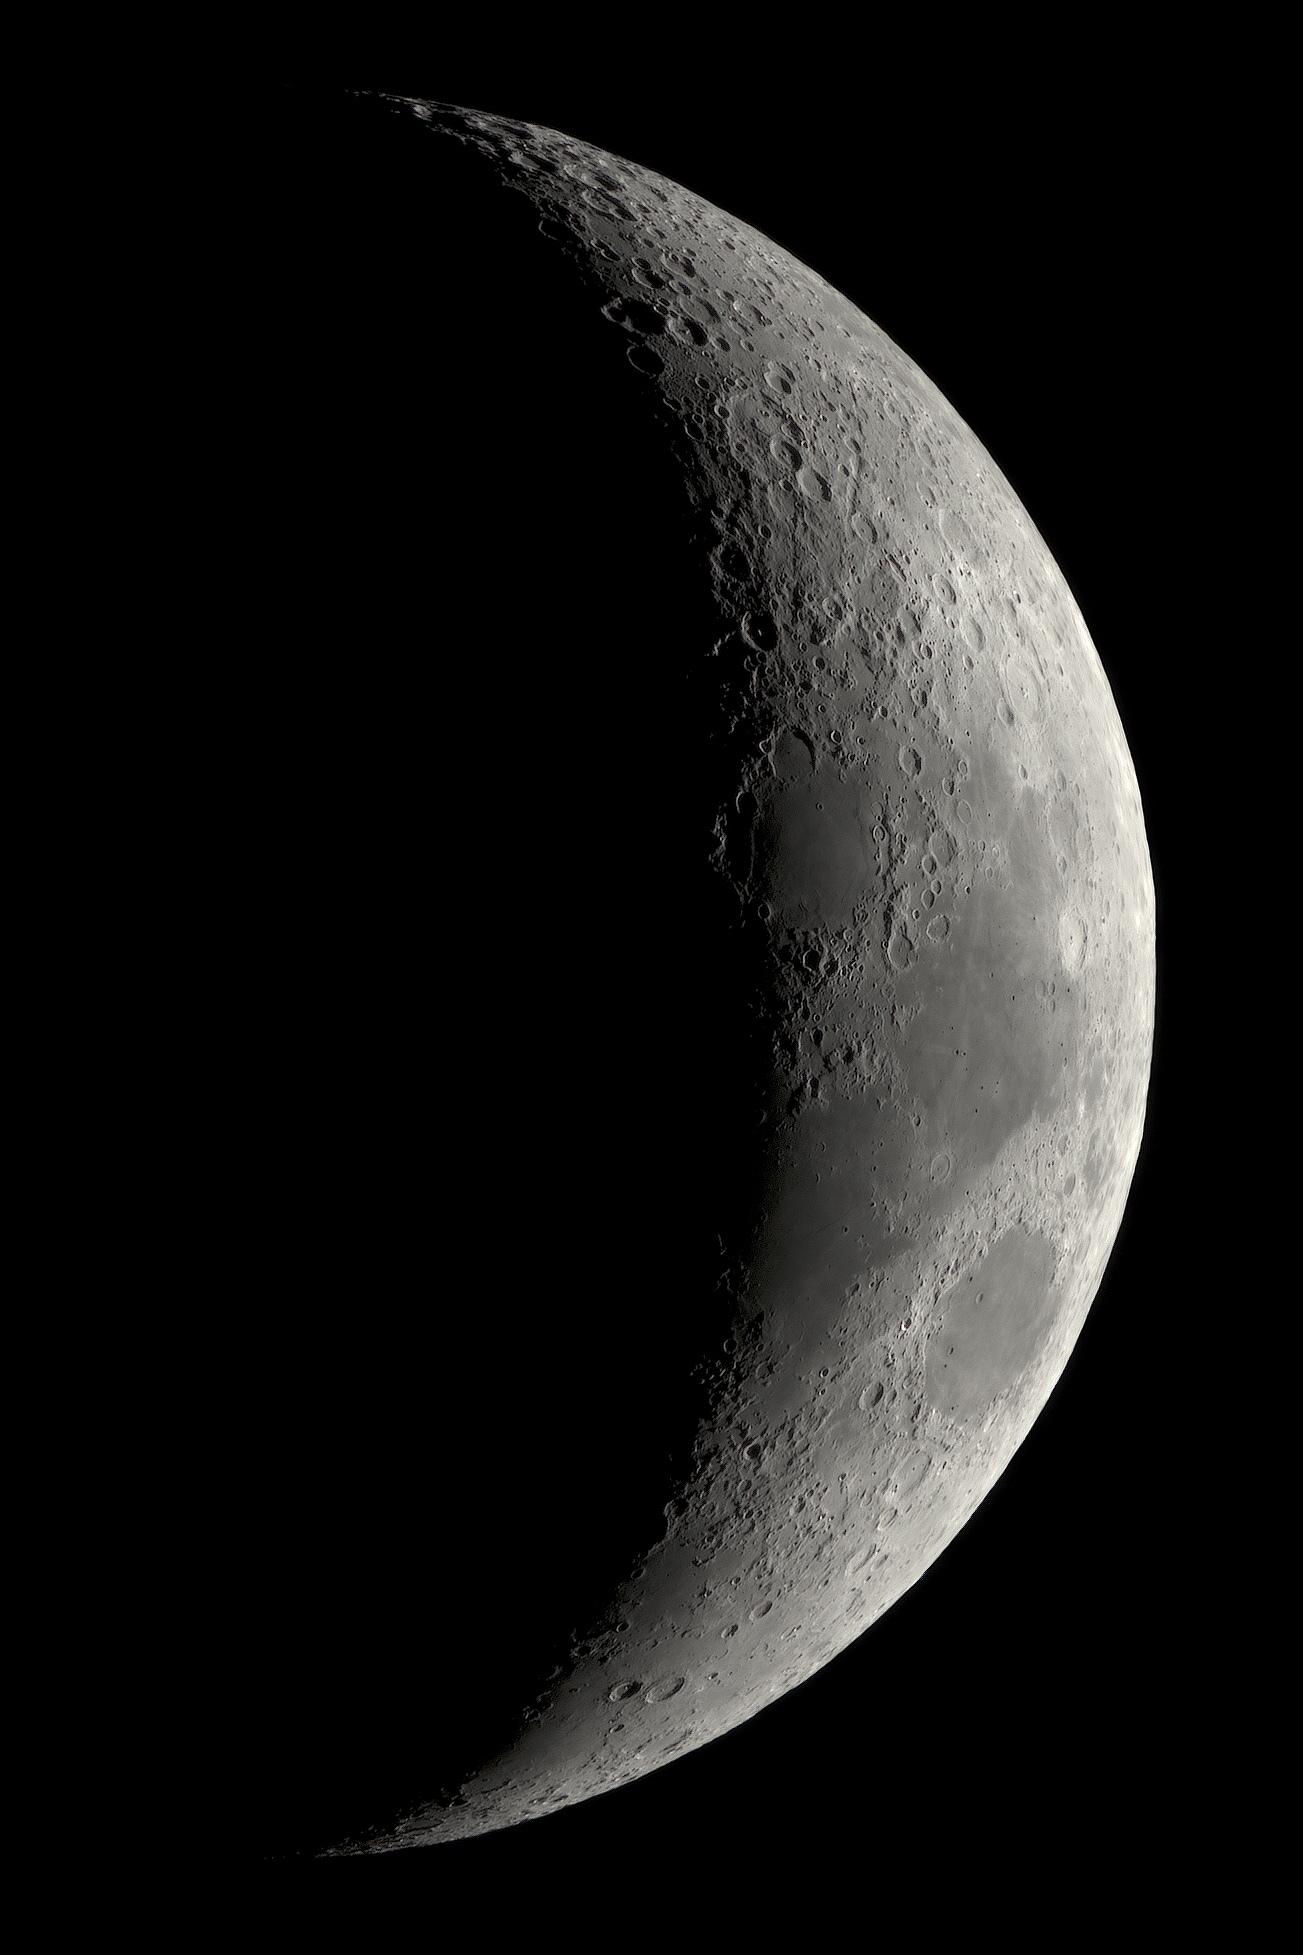 lune-3-7-1-1-1-1.jpg.10271dc2fec7b91d28f4fcef0a88451f.jpg